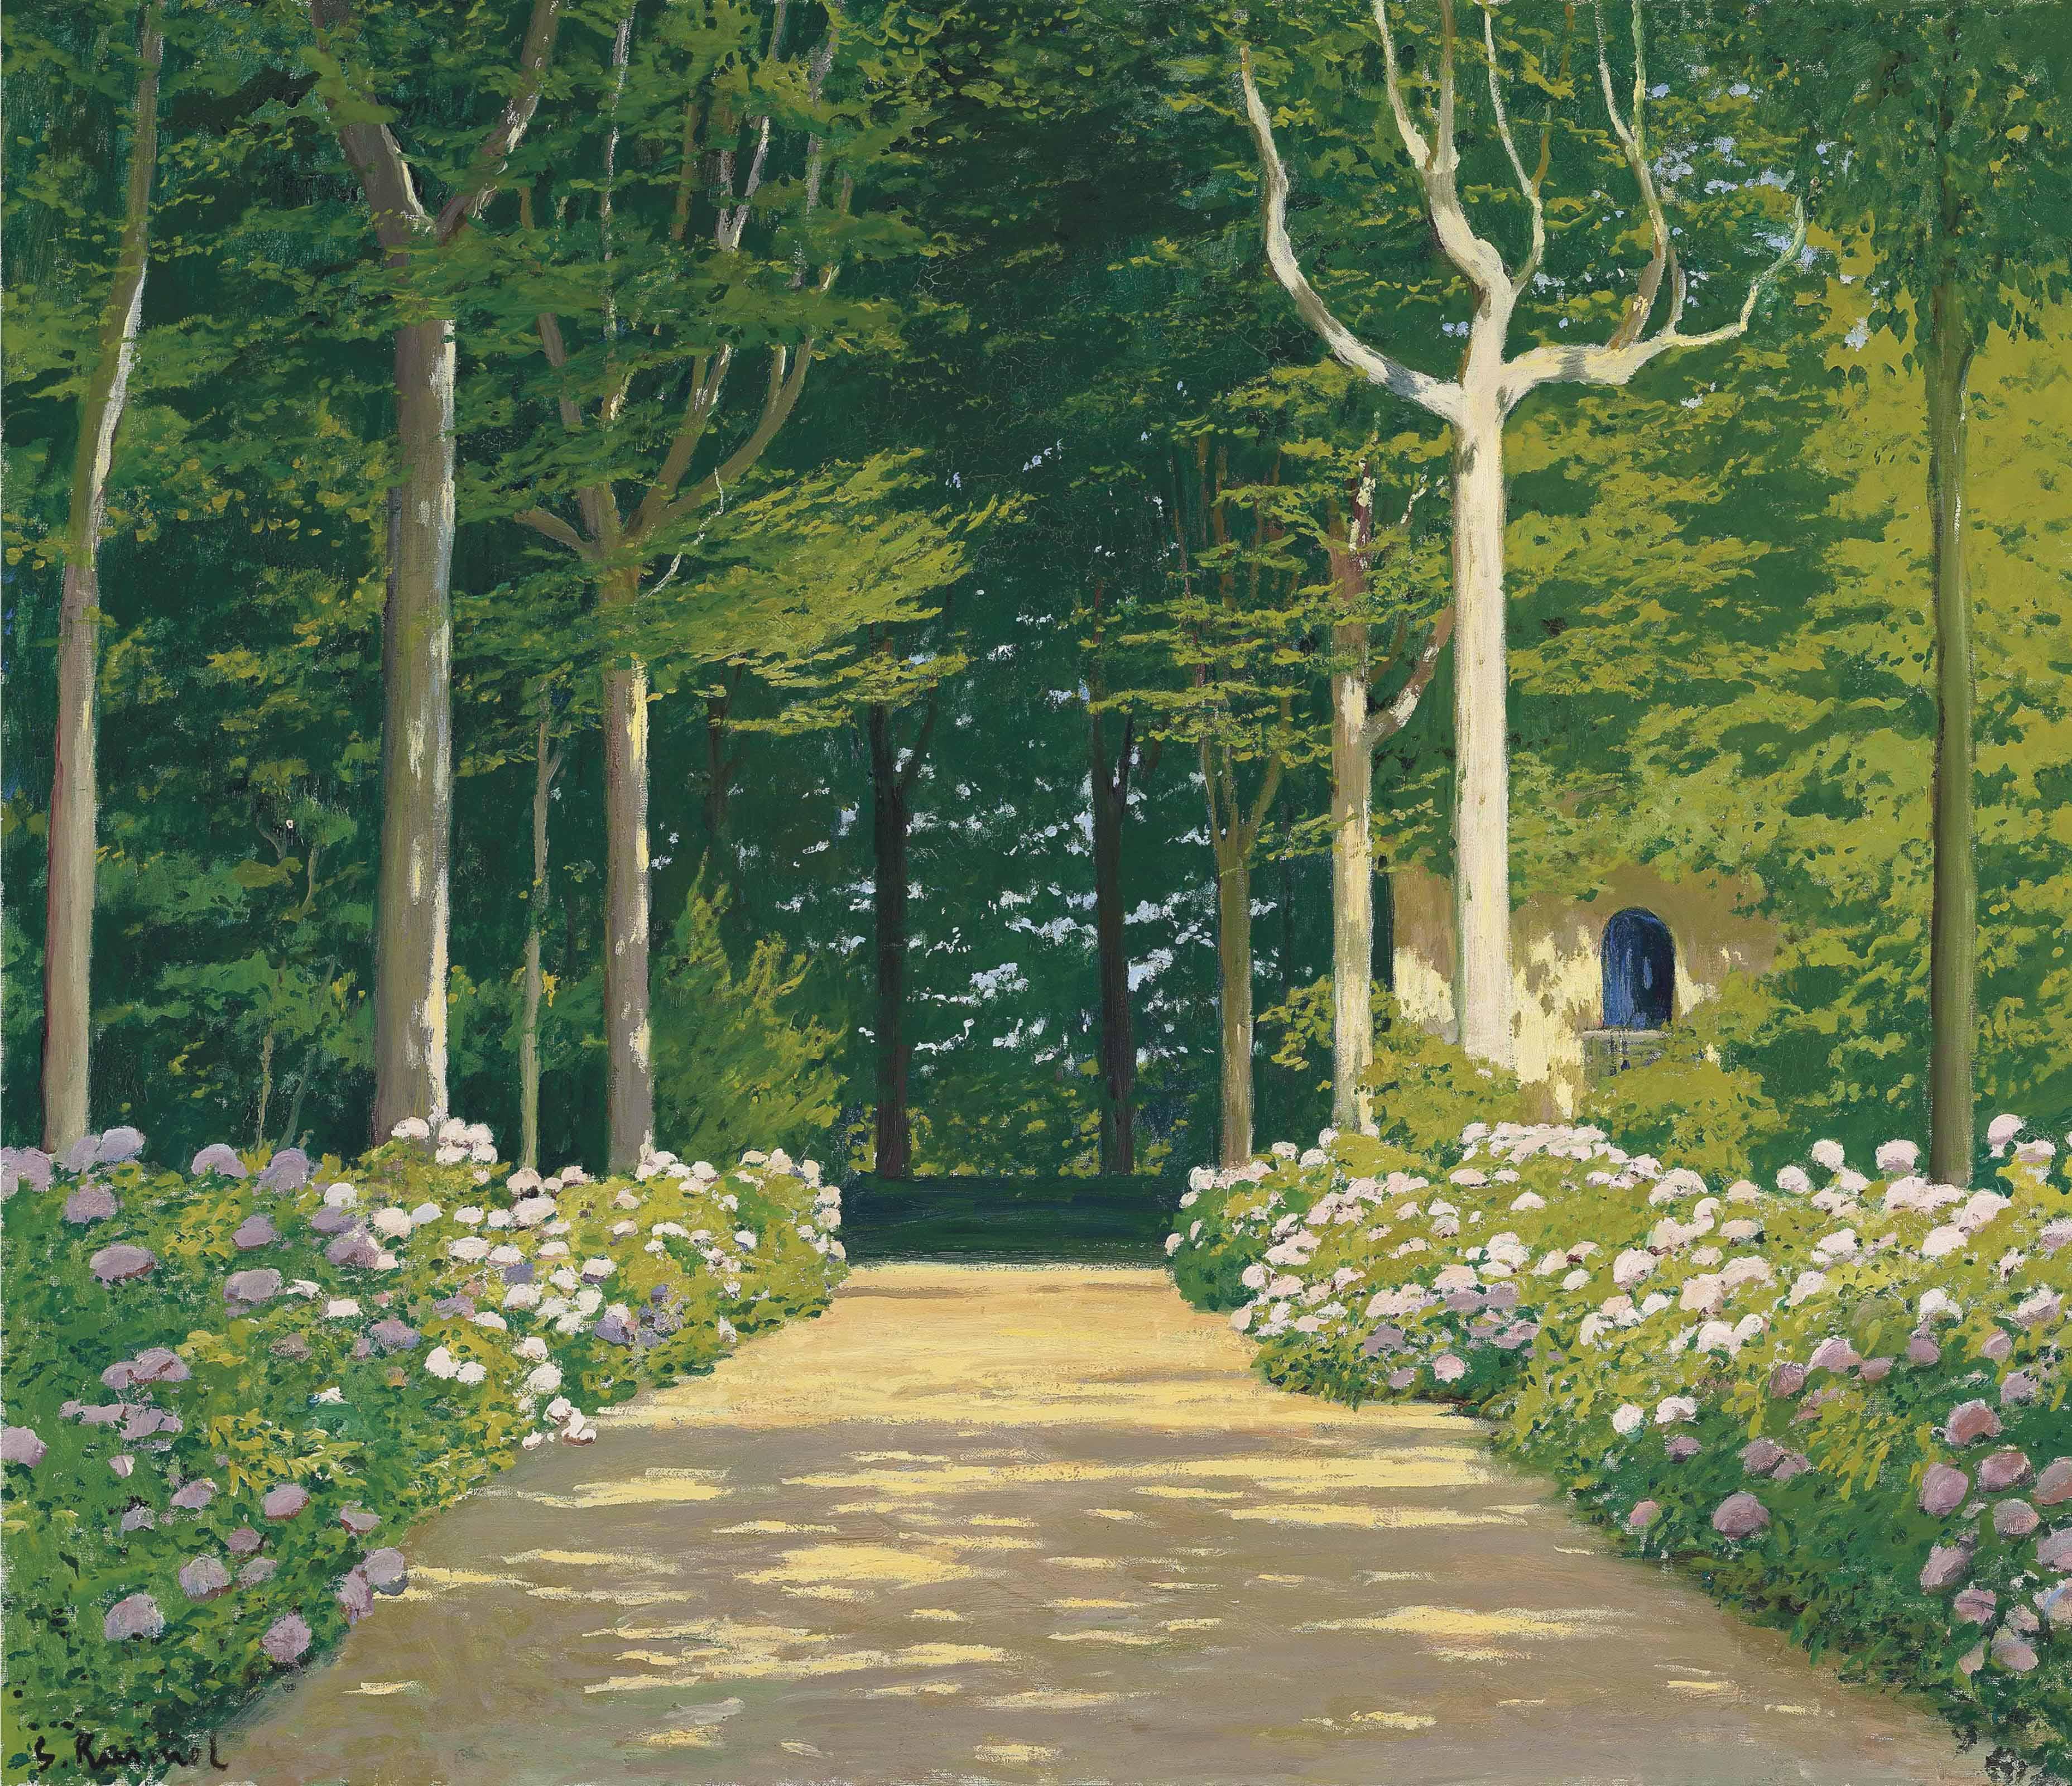 Hydrangeas on a garden path